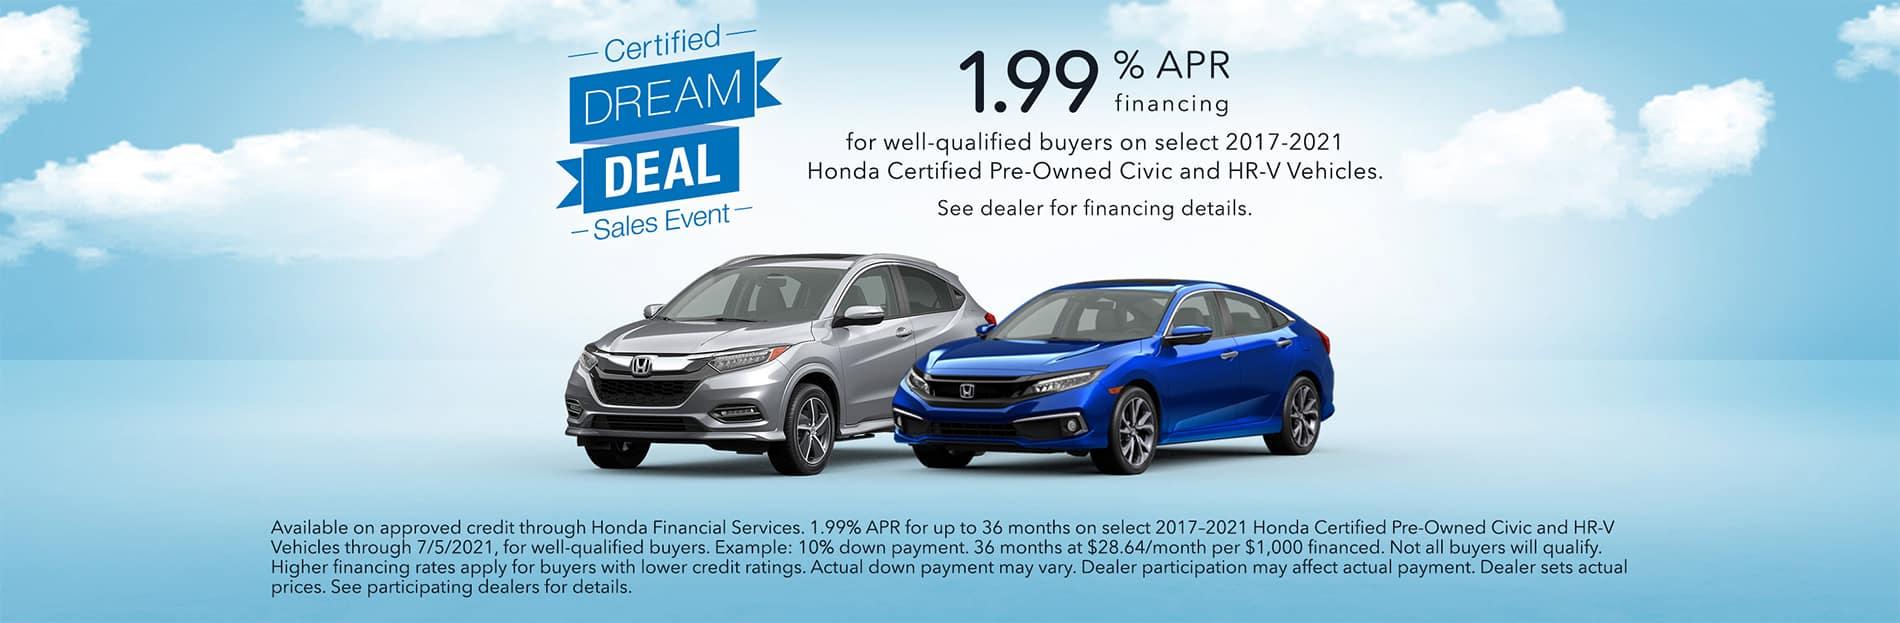 Honda Certified Pre-Owned Financing Offers at Keenan Honda